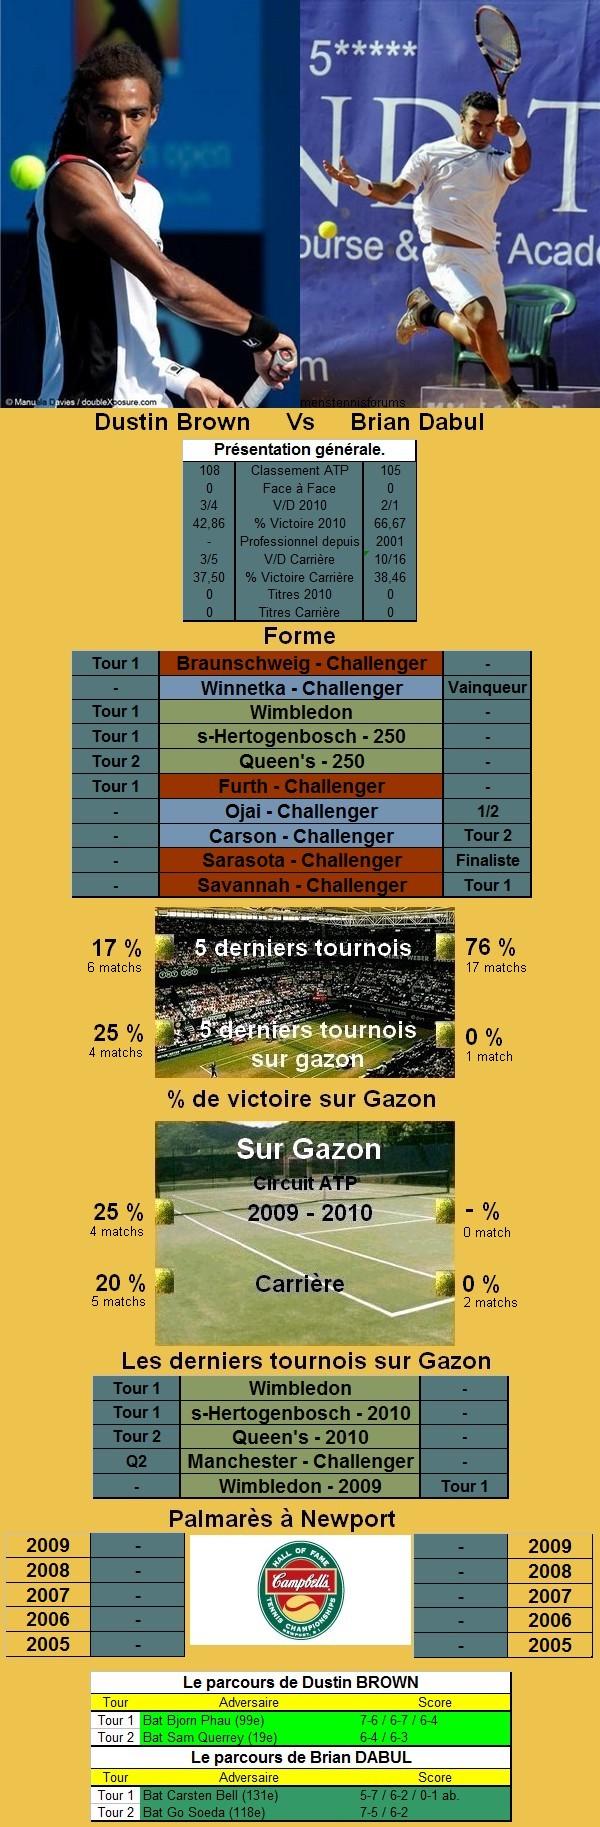 Statistiques tennis de Brown contre Dabul à Newport